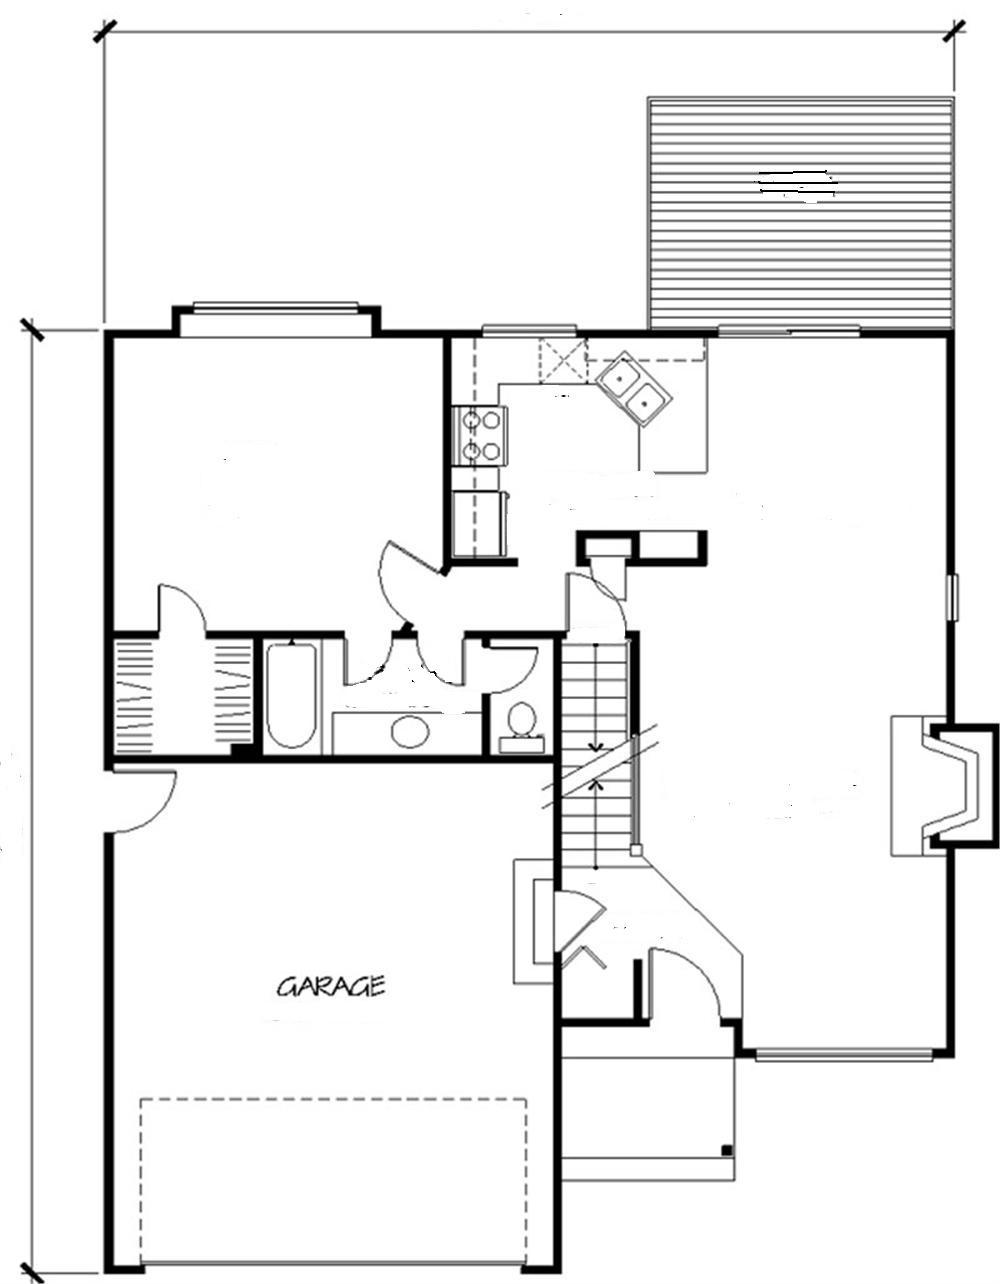 Planos de casas modelos y dise os de casas planos de for Planos de construccion de casas gratis